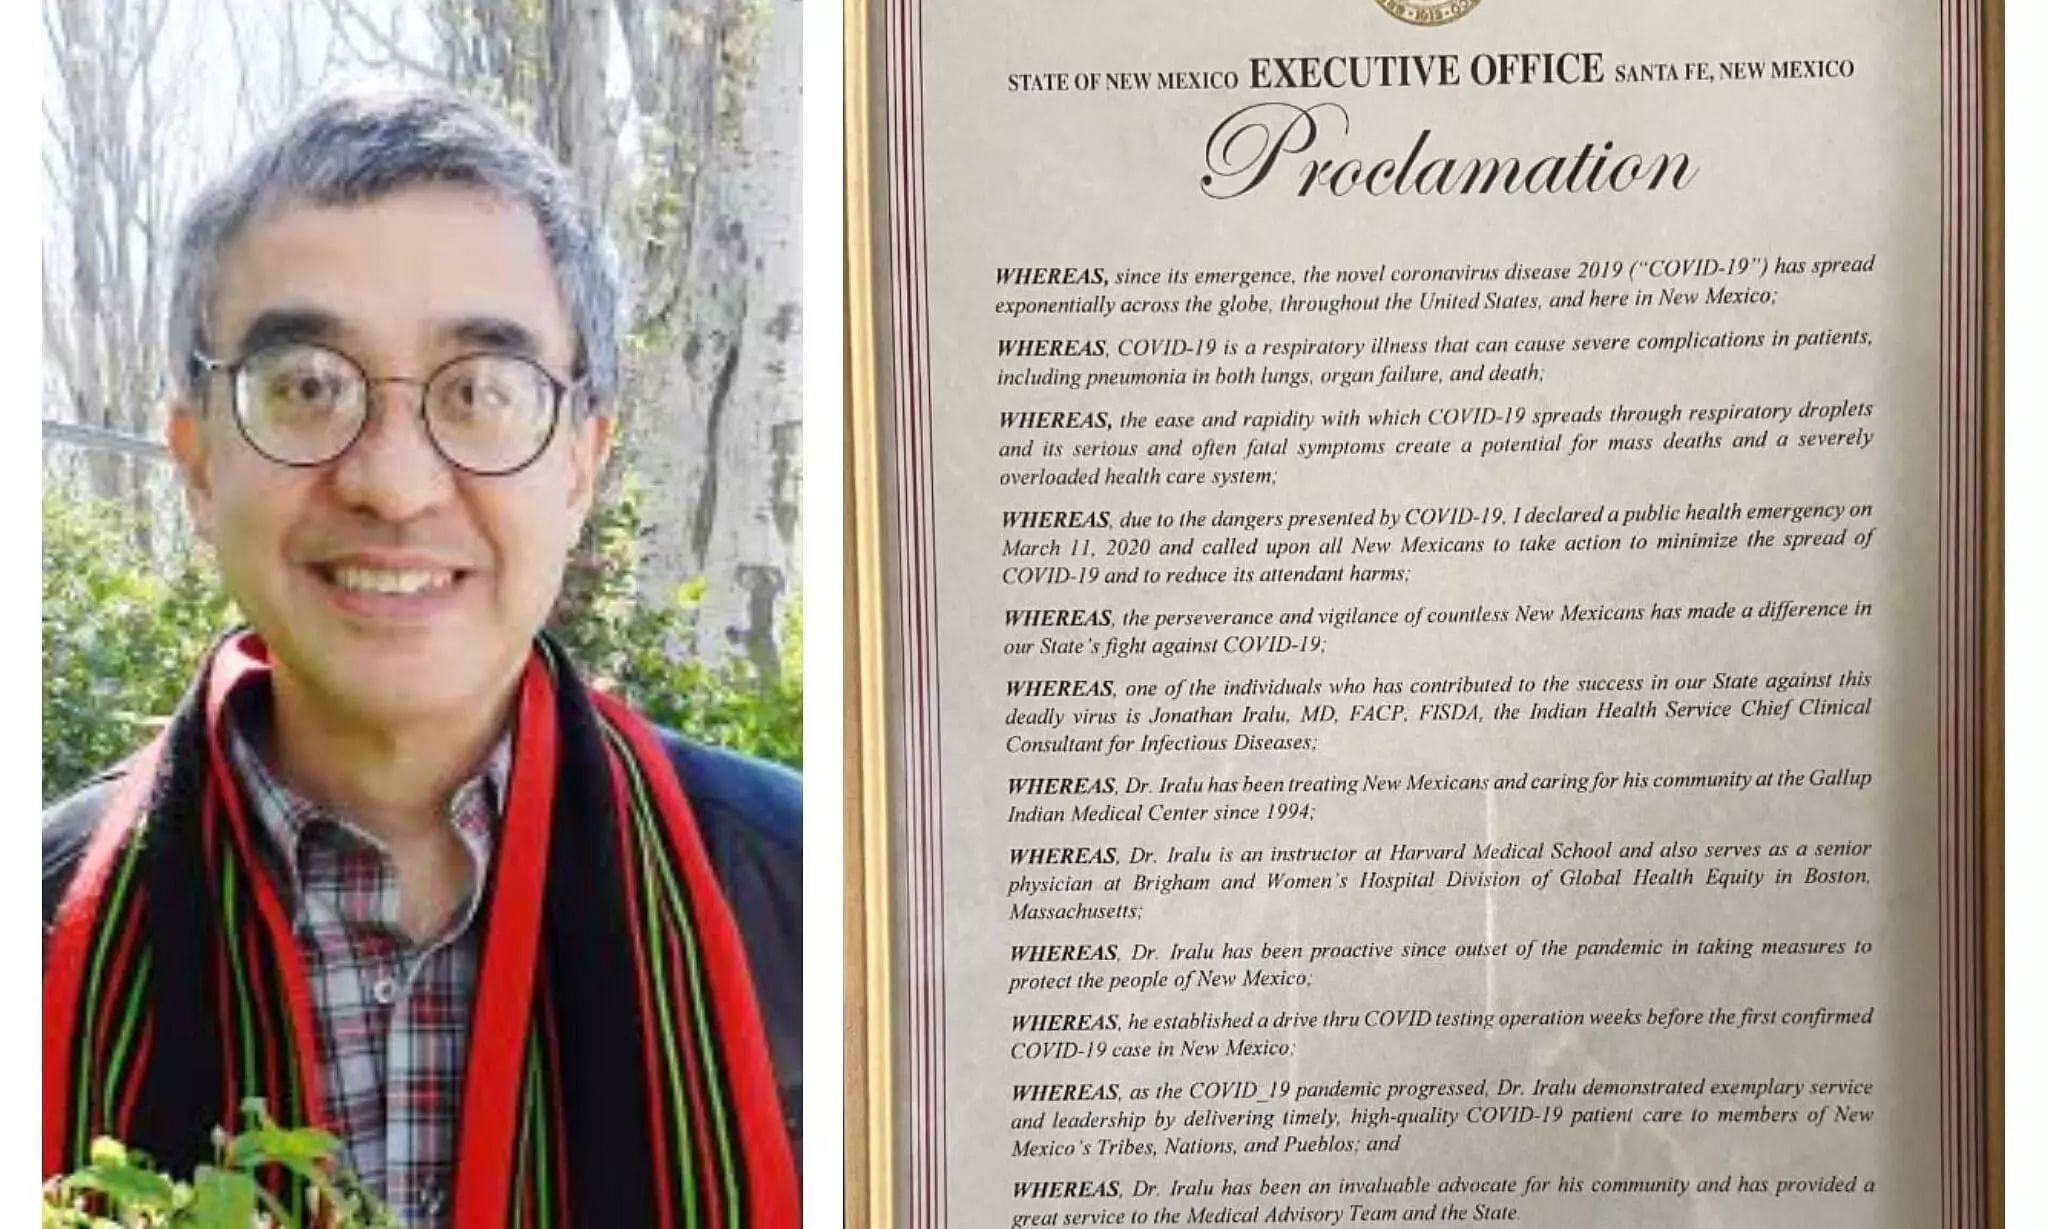 New Mexico Celebrates July 19 in Name of Naga Doctor Jonathan Iralu